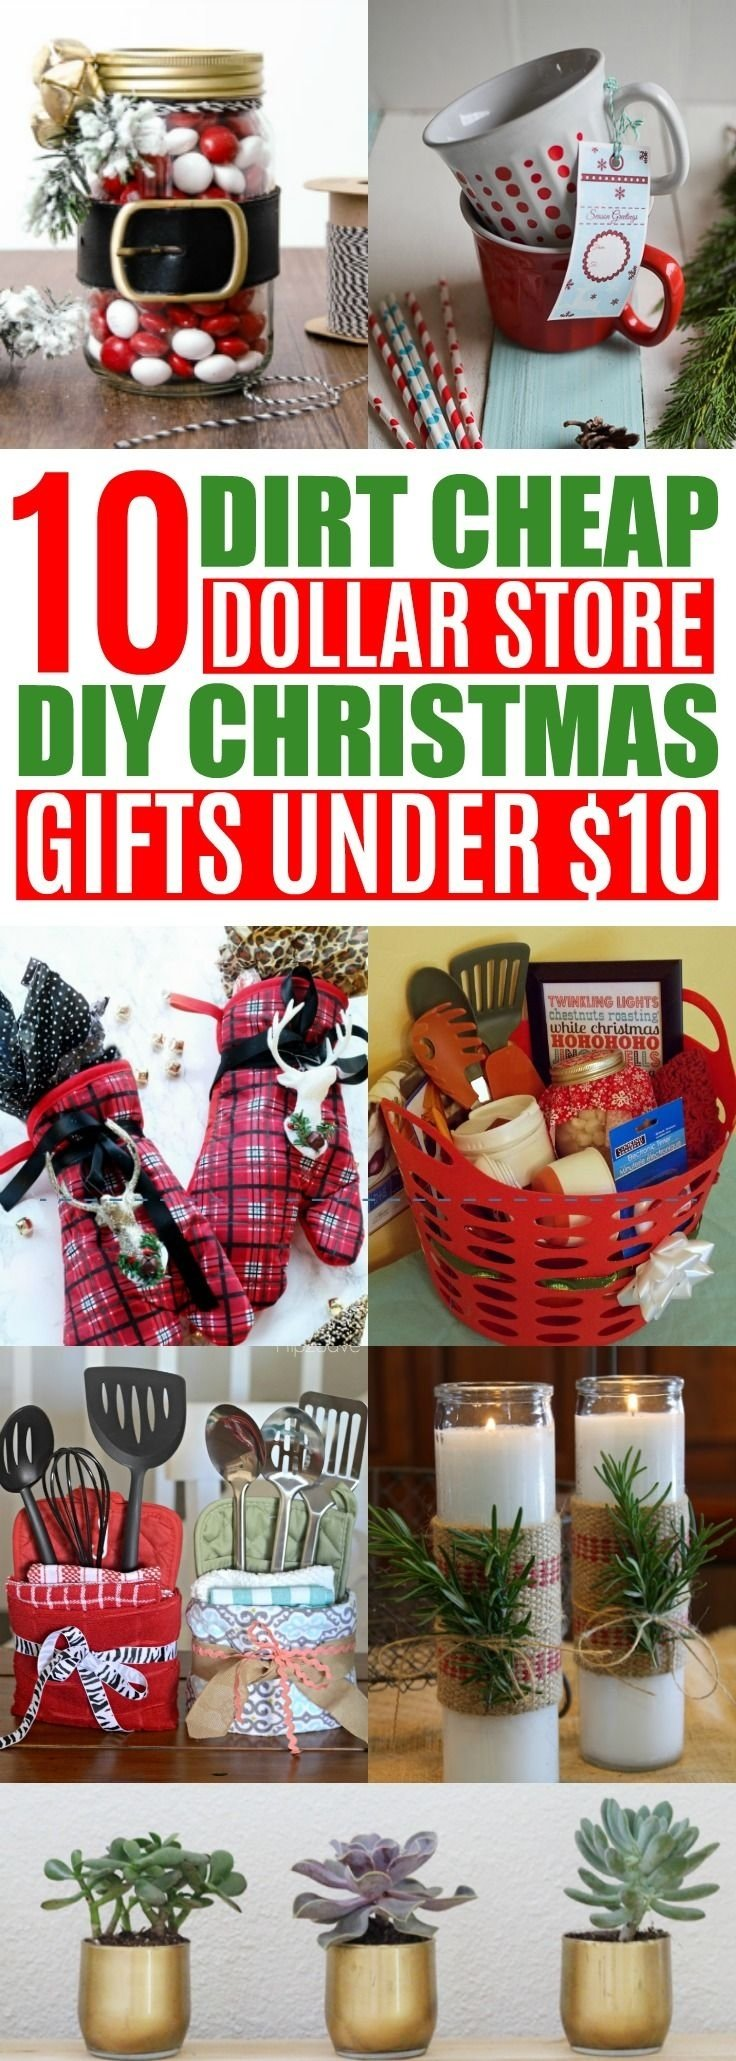 10 Trendy Cheap Christmas Gift Ideas For Family 10 diy cheap christmas gift ideas from the dollar store under 10 5 2020